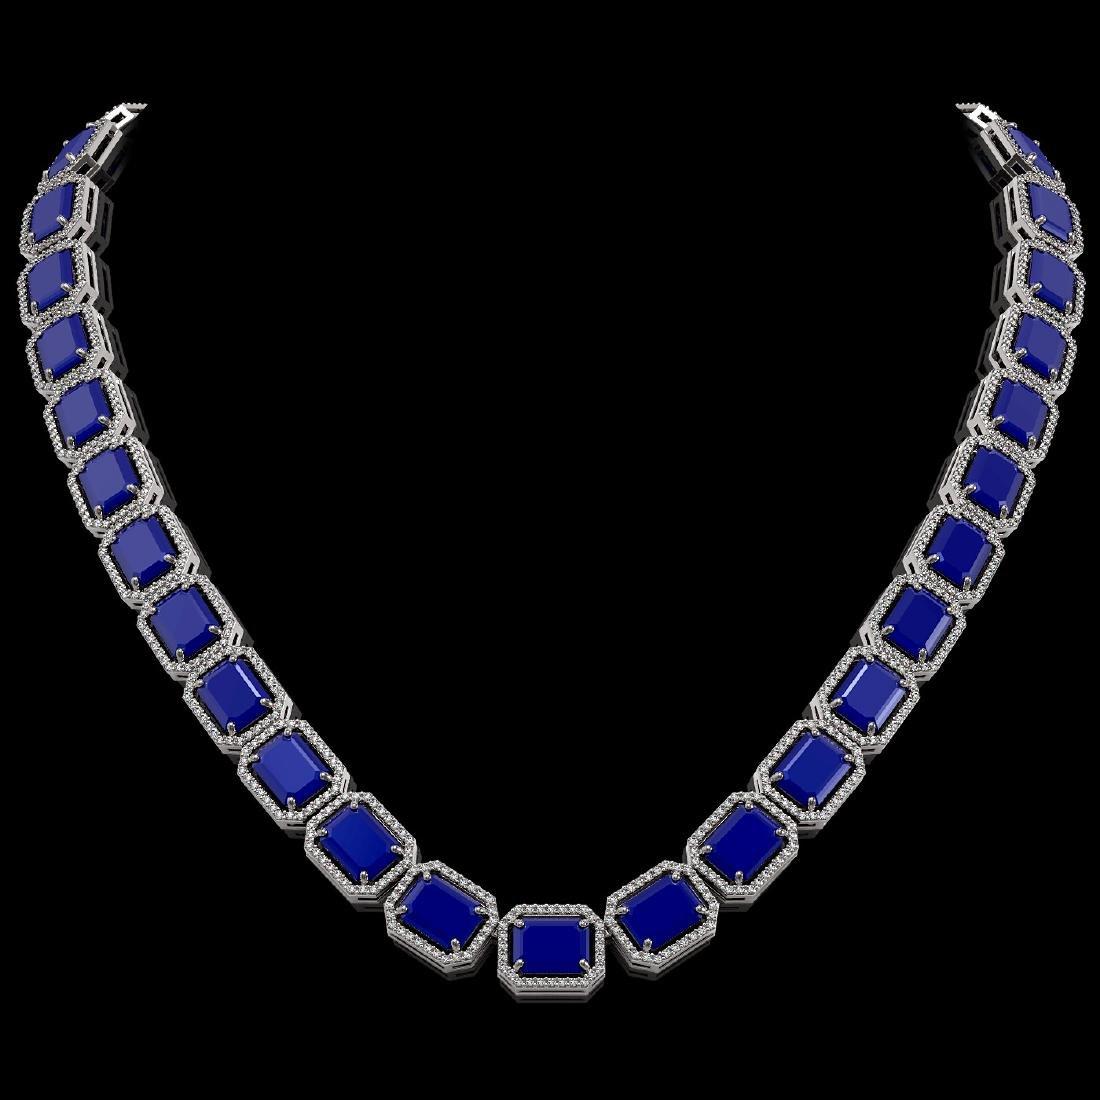 84.94 CTW Sapphire & Diamond Halo Necklace 10K White